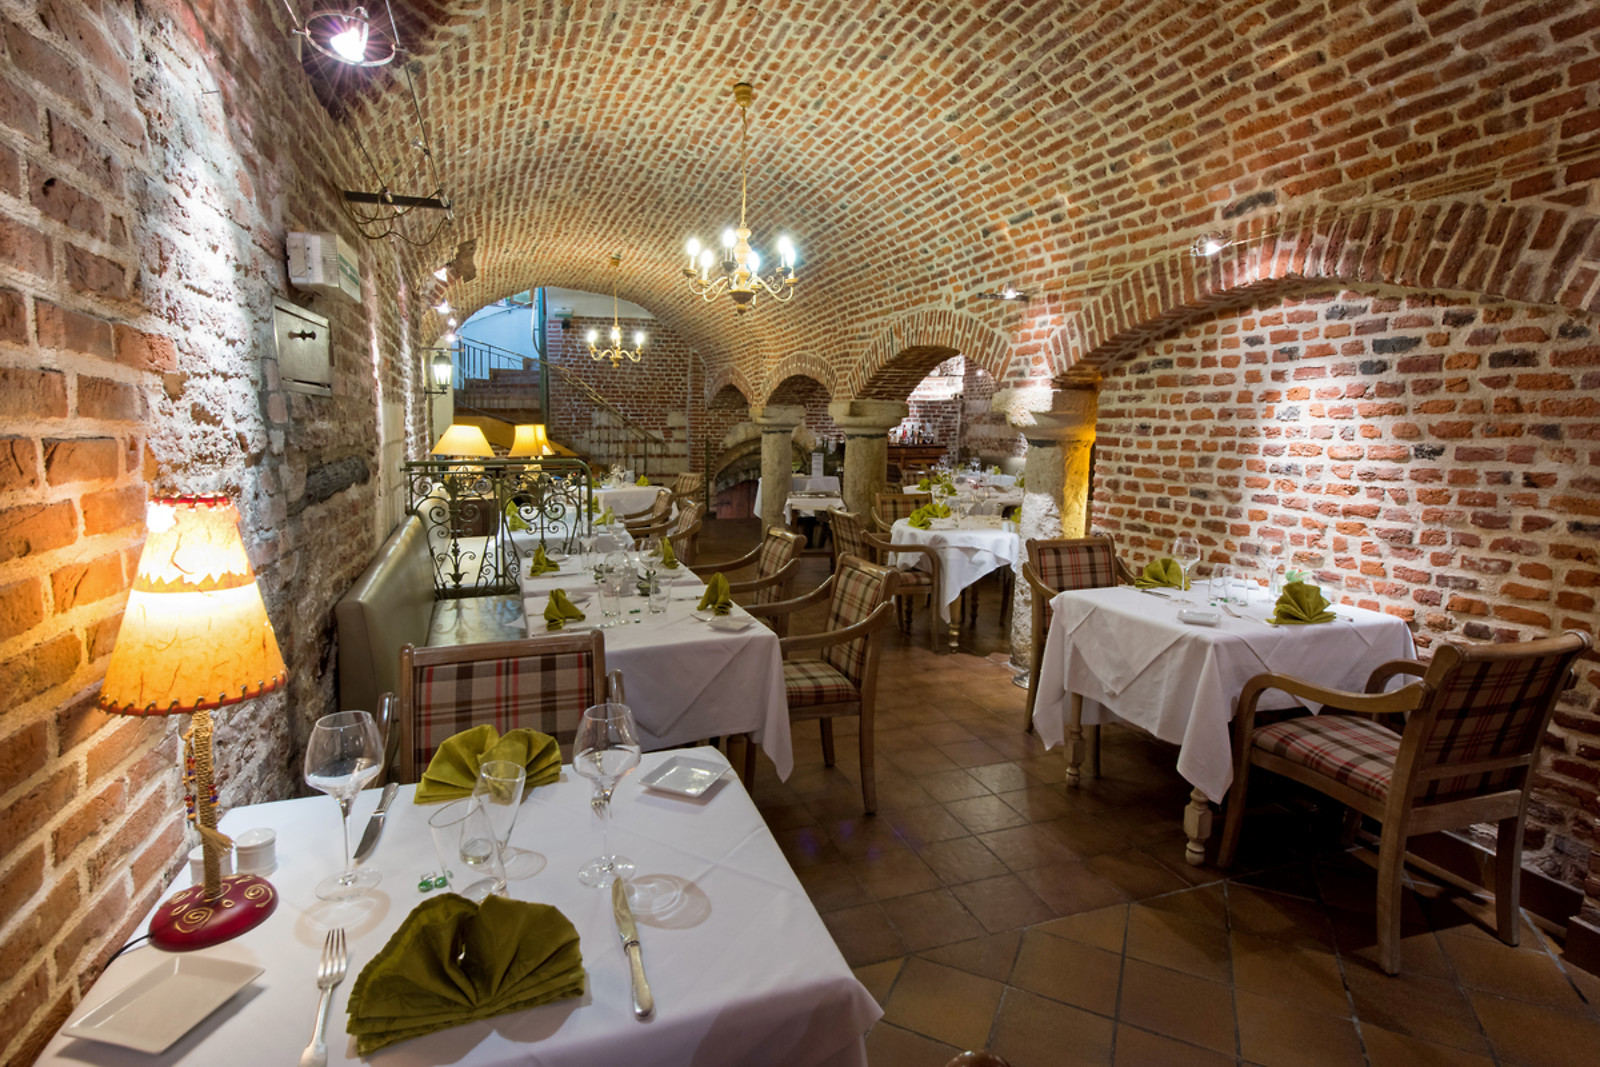 Restaurant Arras Dimanche